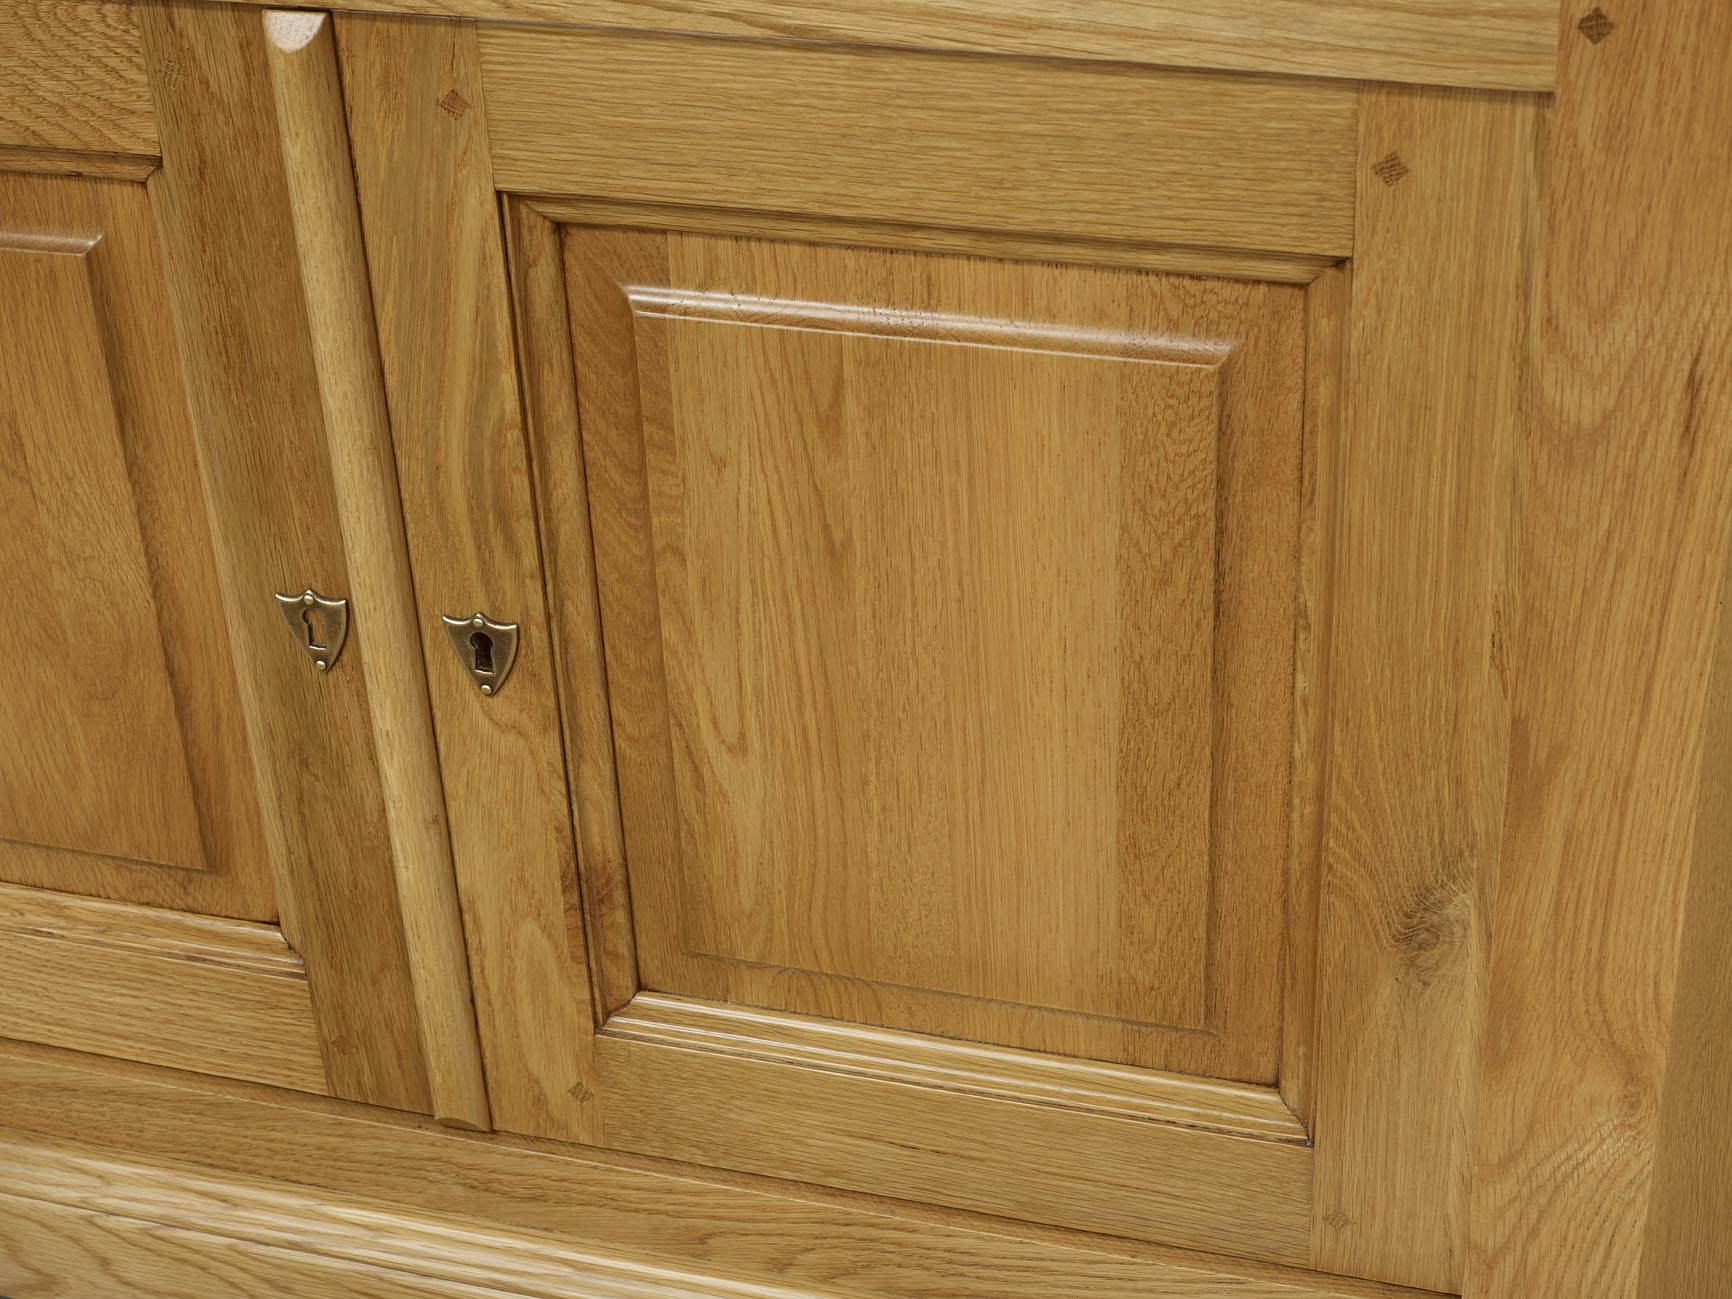 Meuble tv d 39 angle arnaud en ch ne massif de style louis for Entretien meuble chene massif